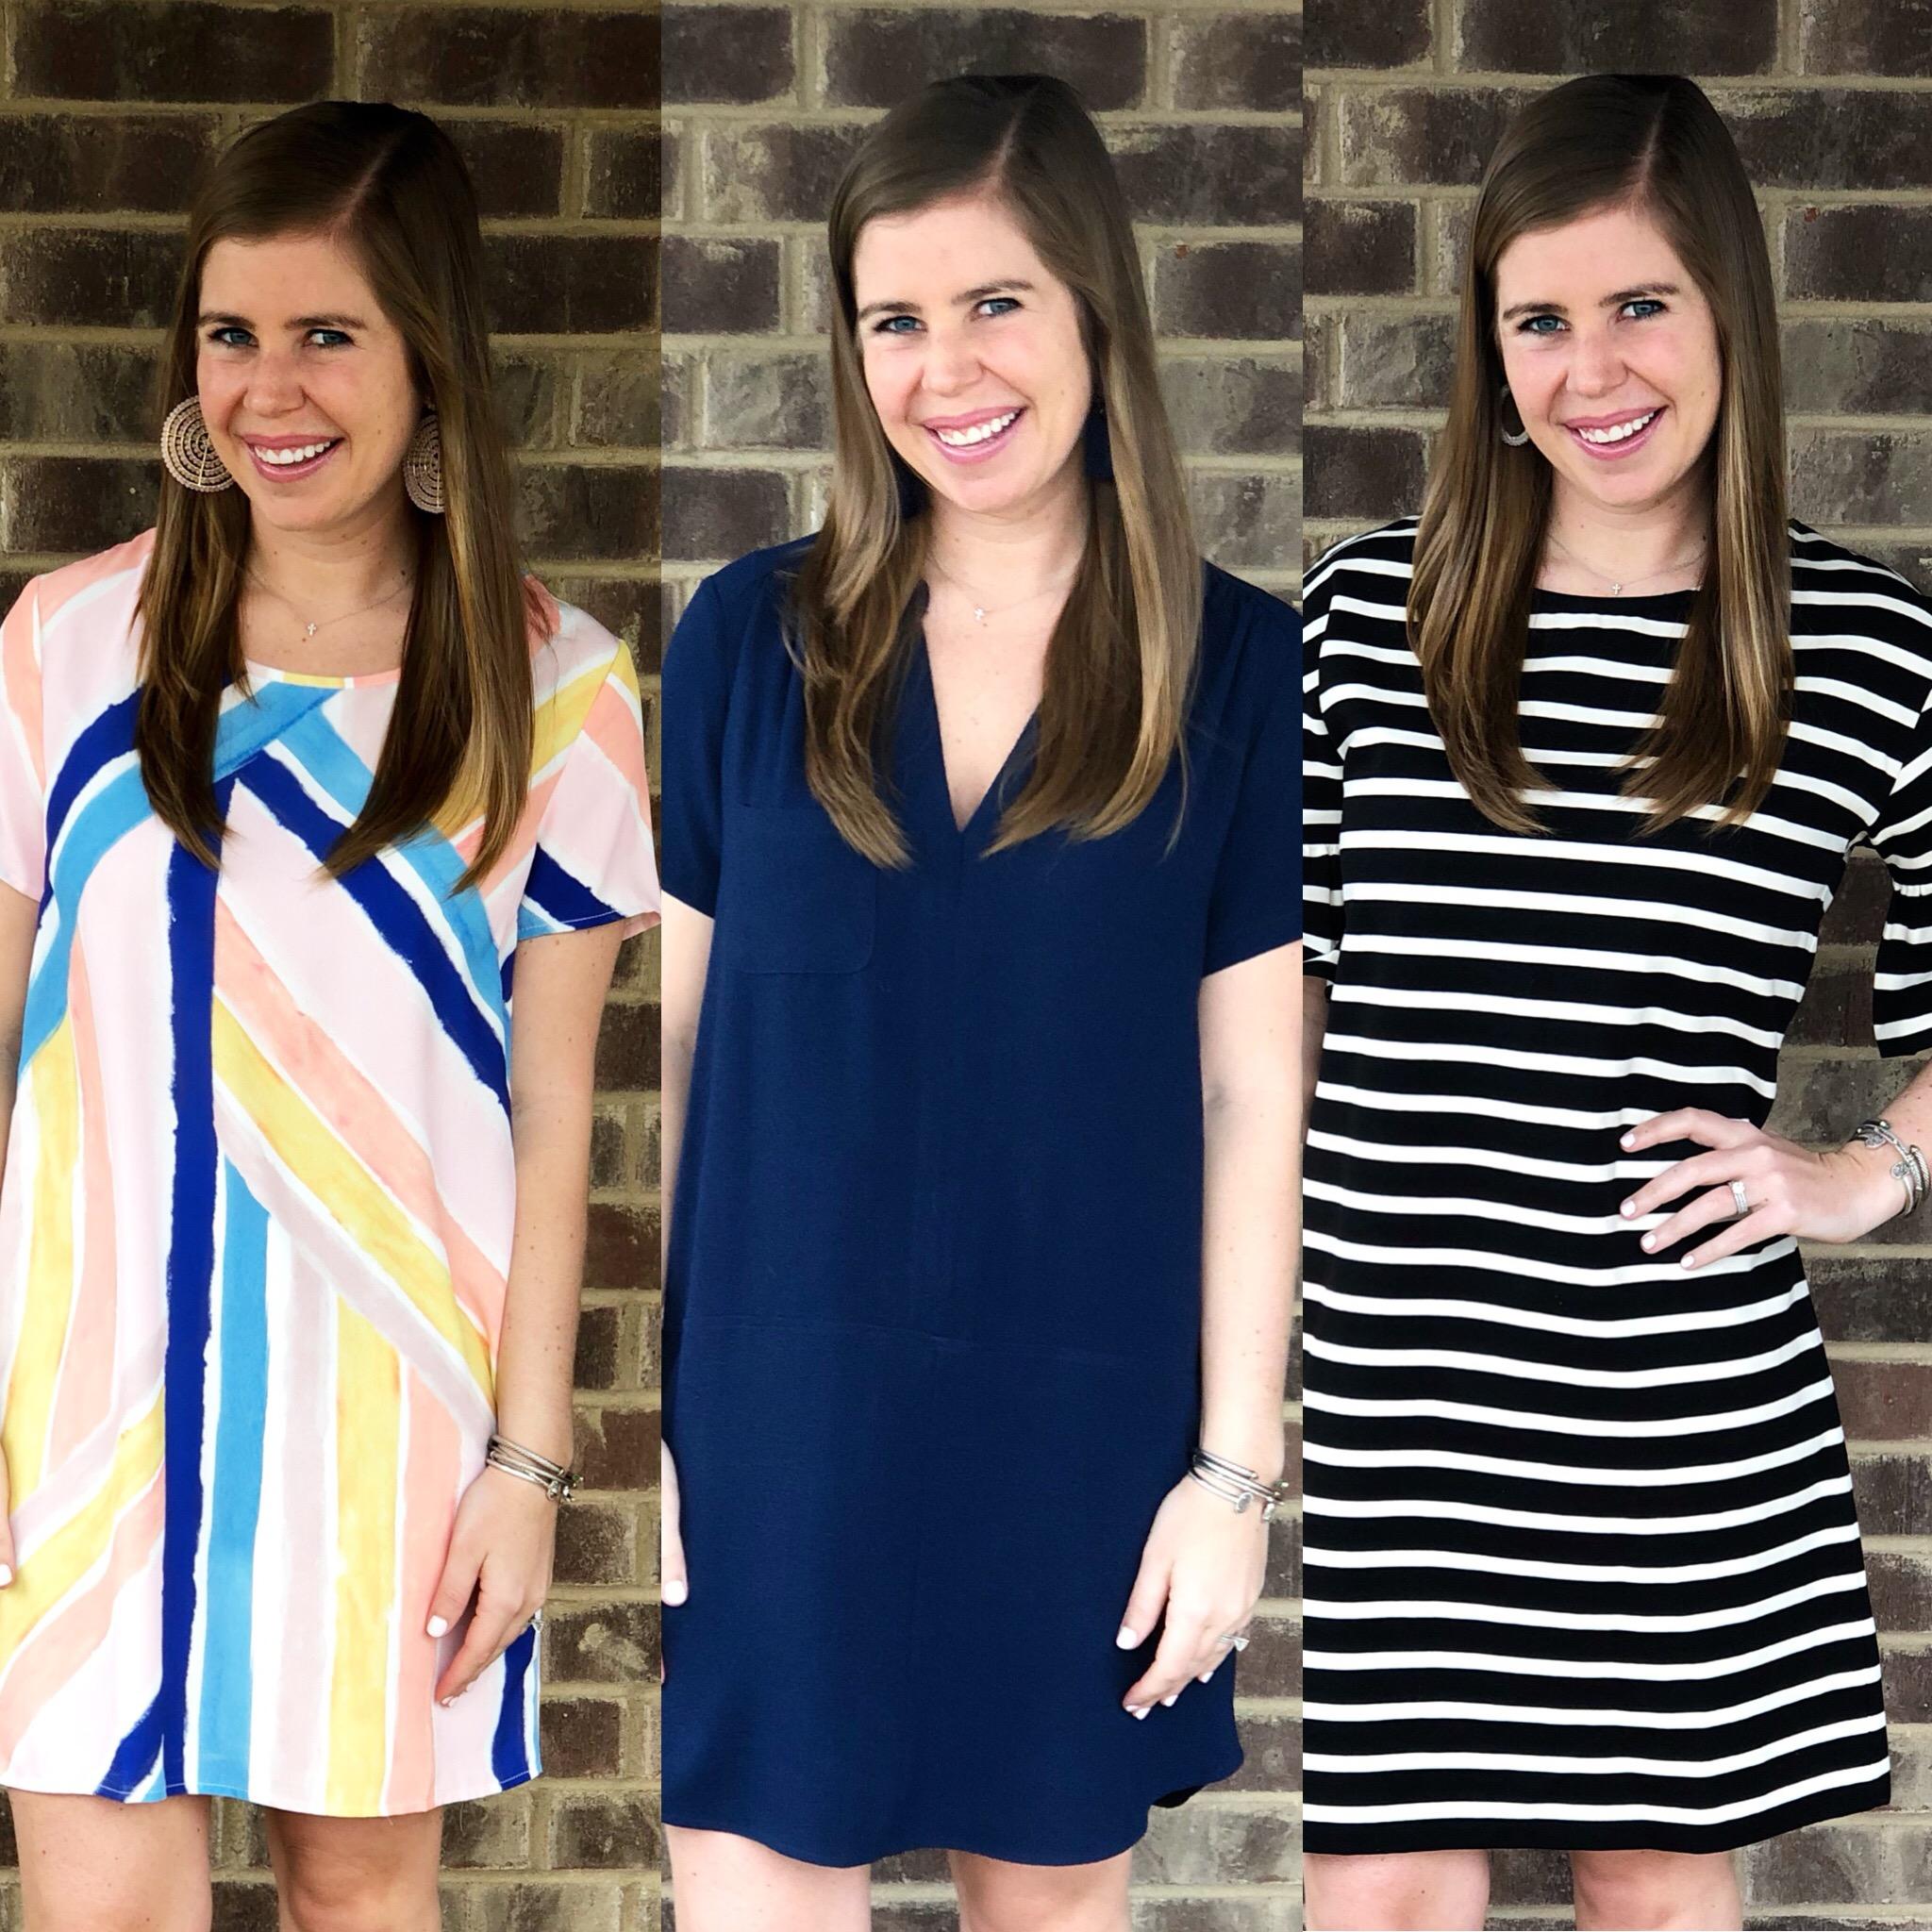 Dress 1    |    Dress 2    |    Dress 3